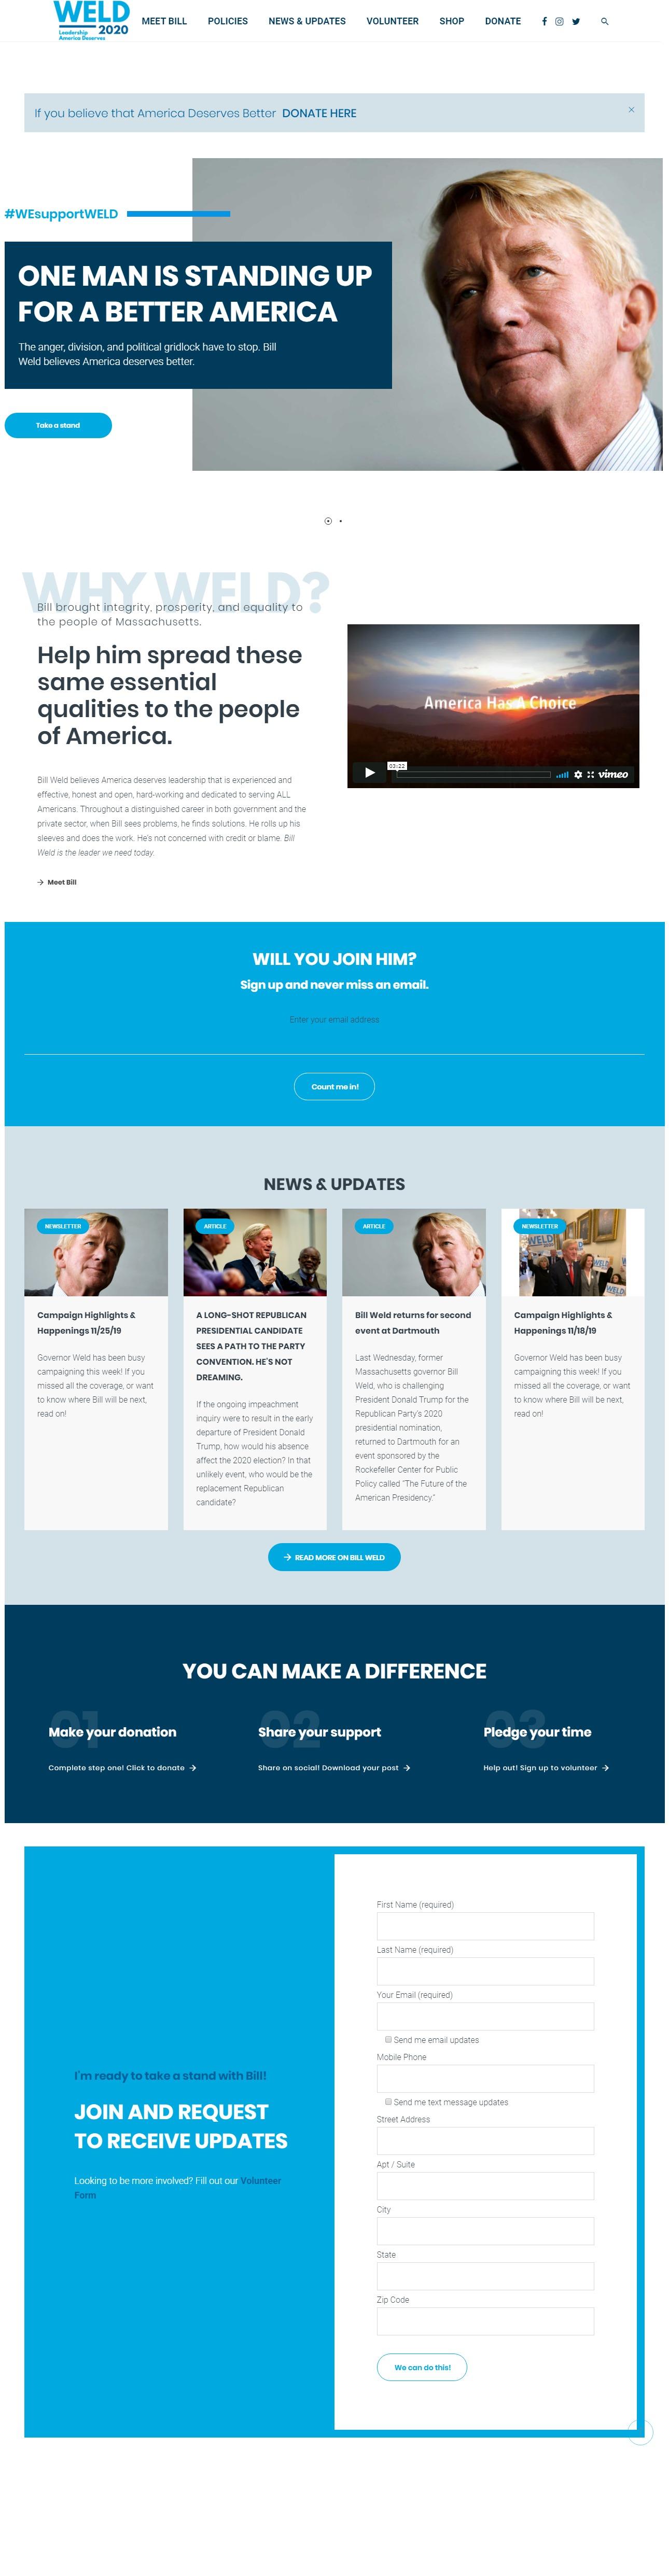 Homepage Snapshot for December 1, 2019: Former Governor Bill Weld